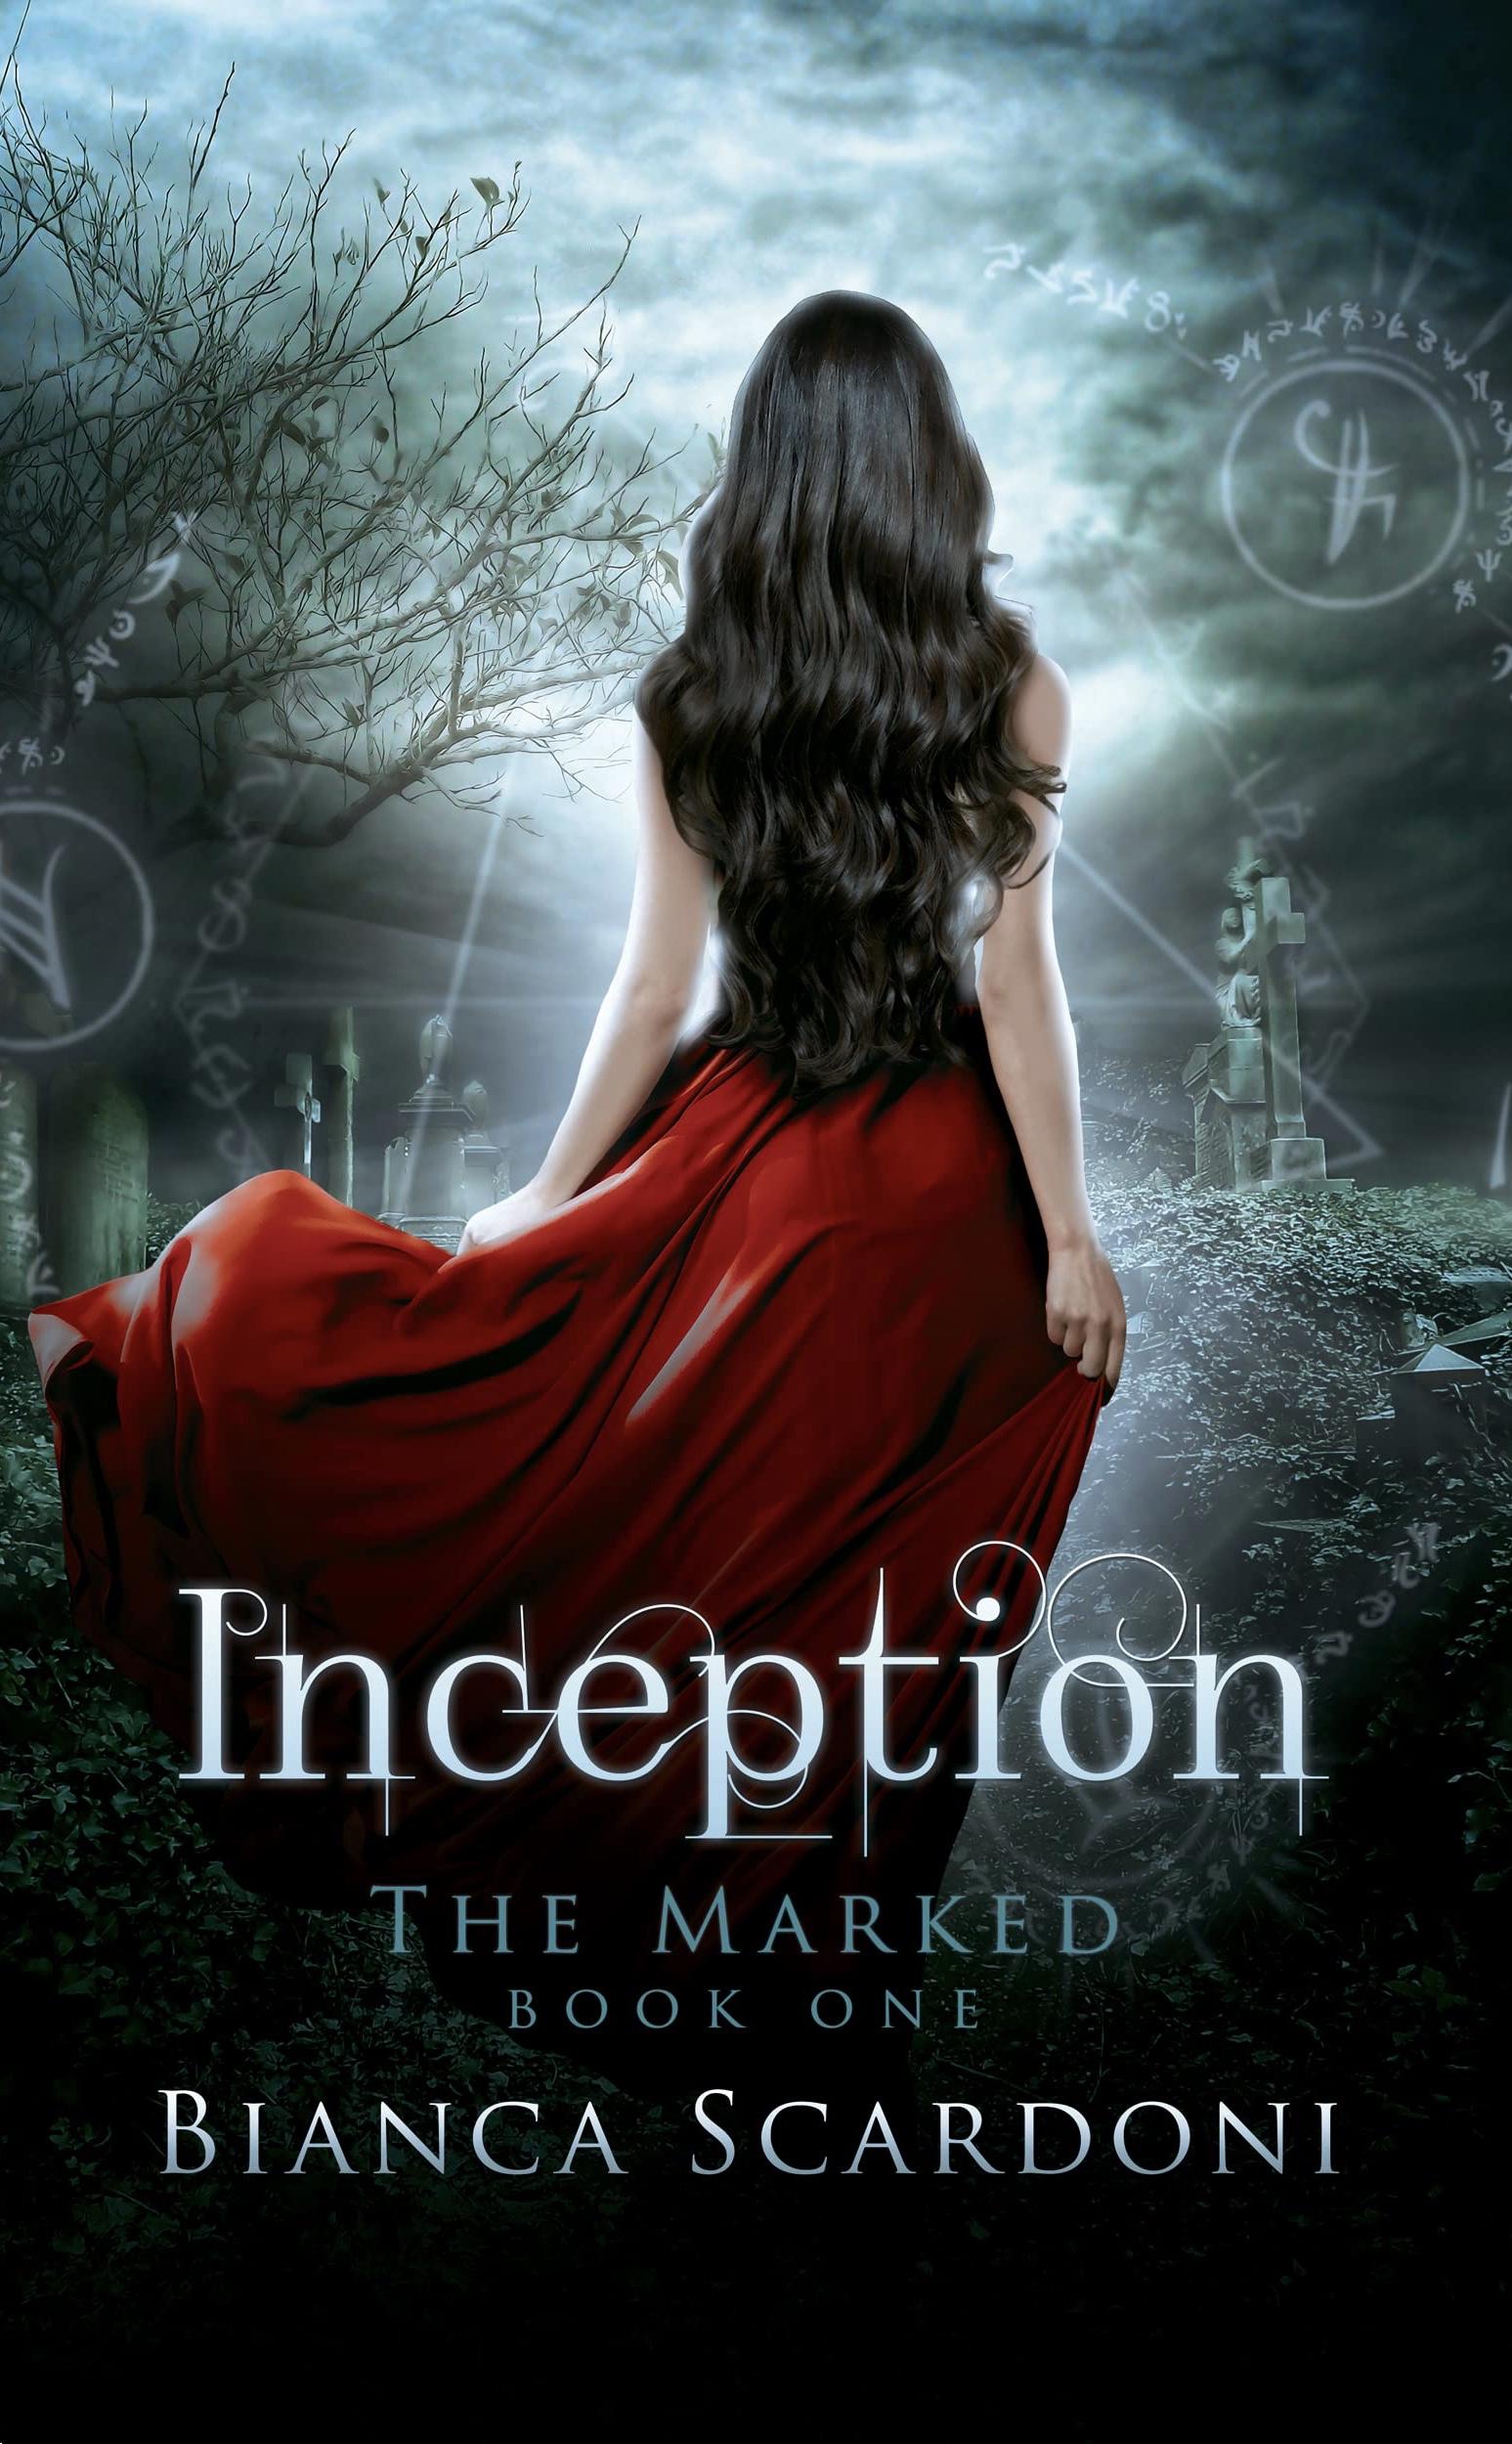 Inception by Bianca Scardoni